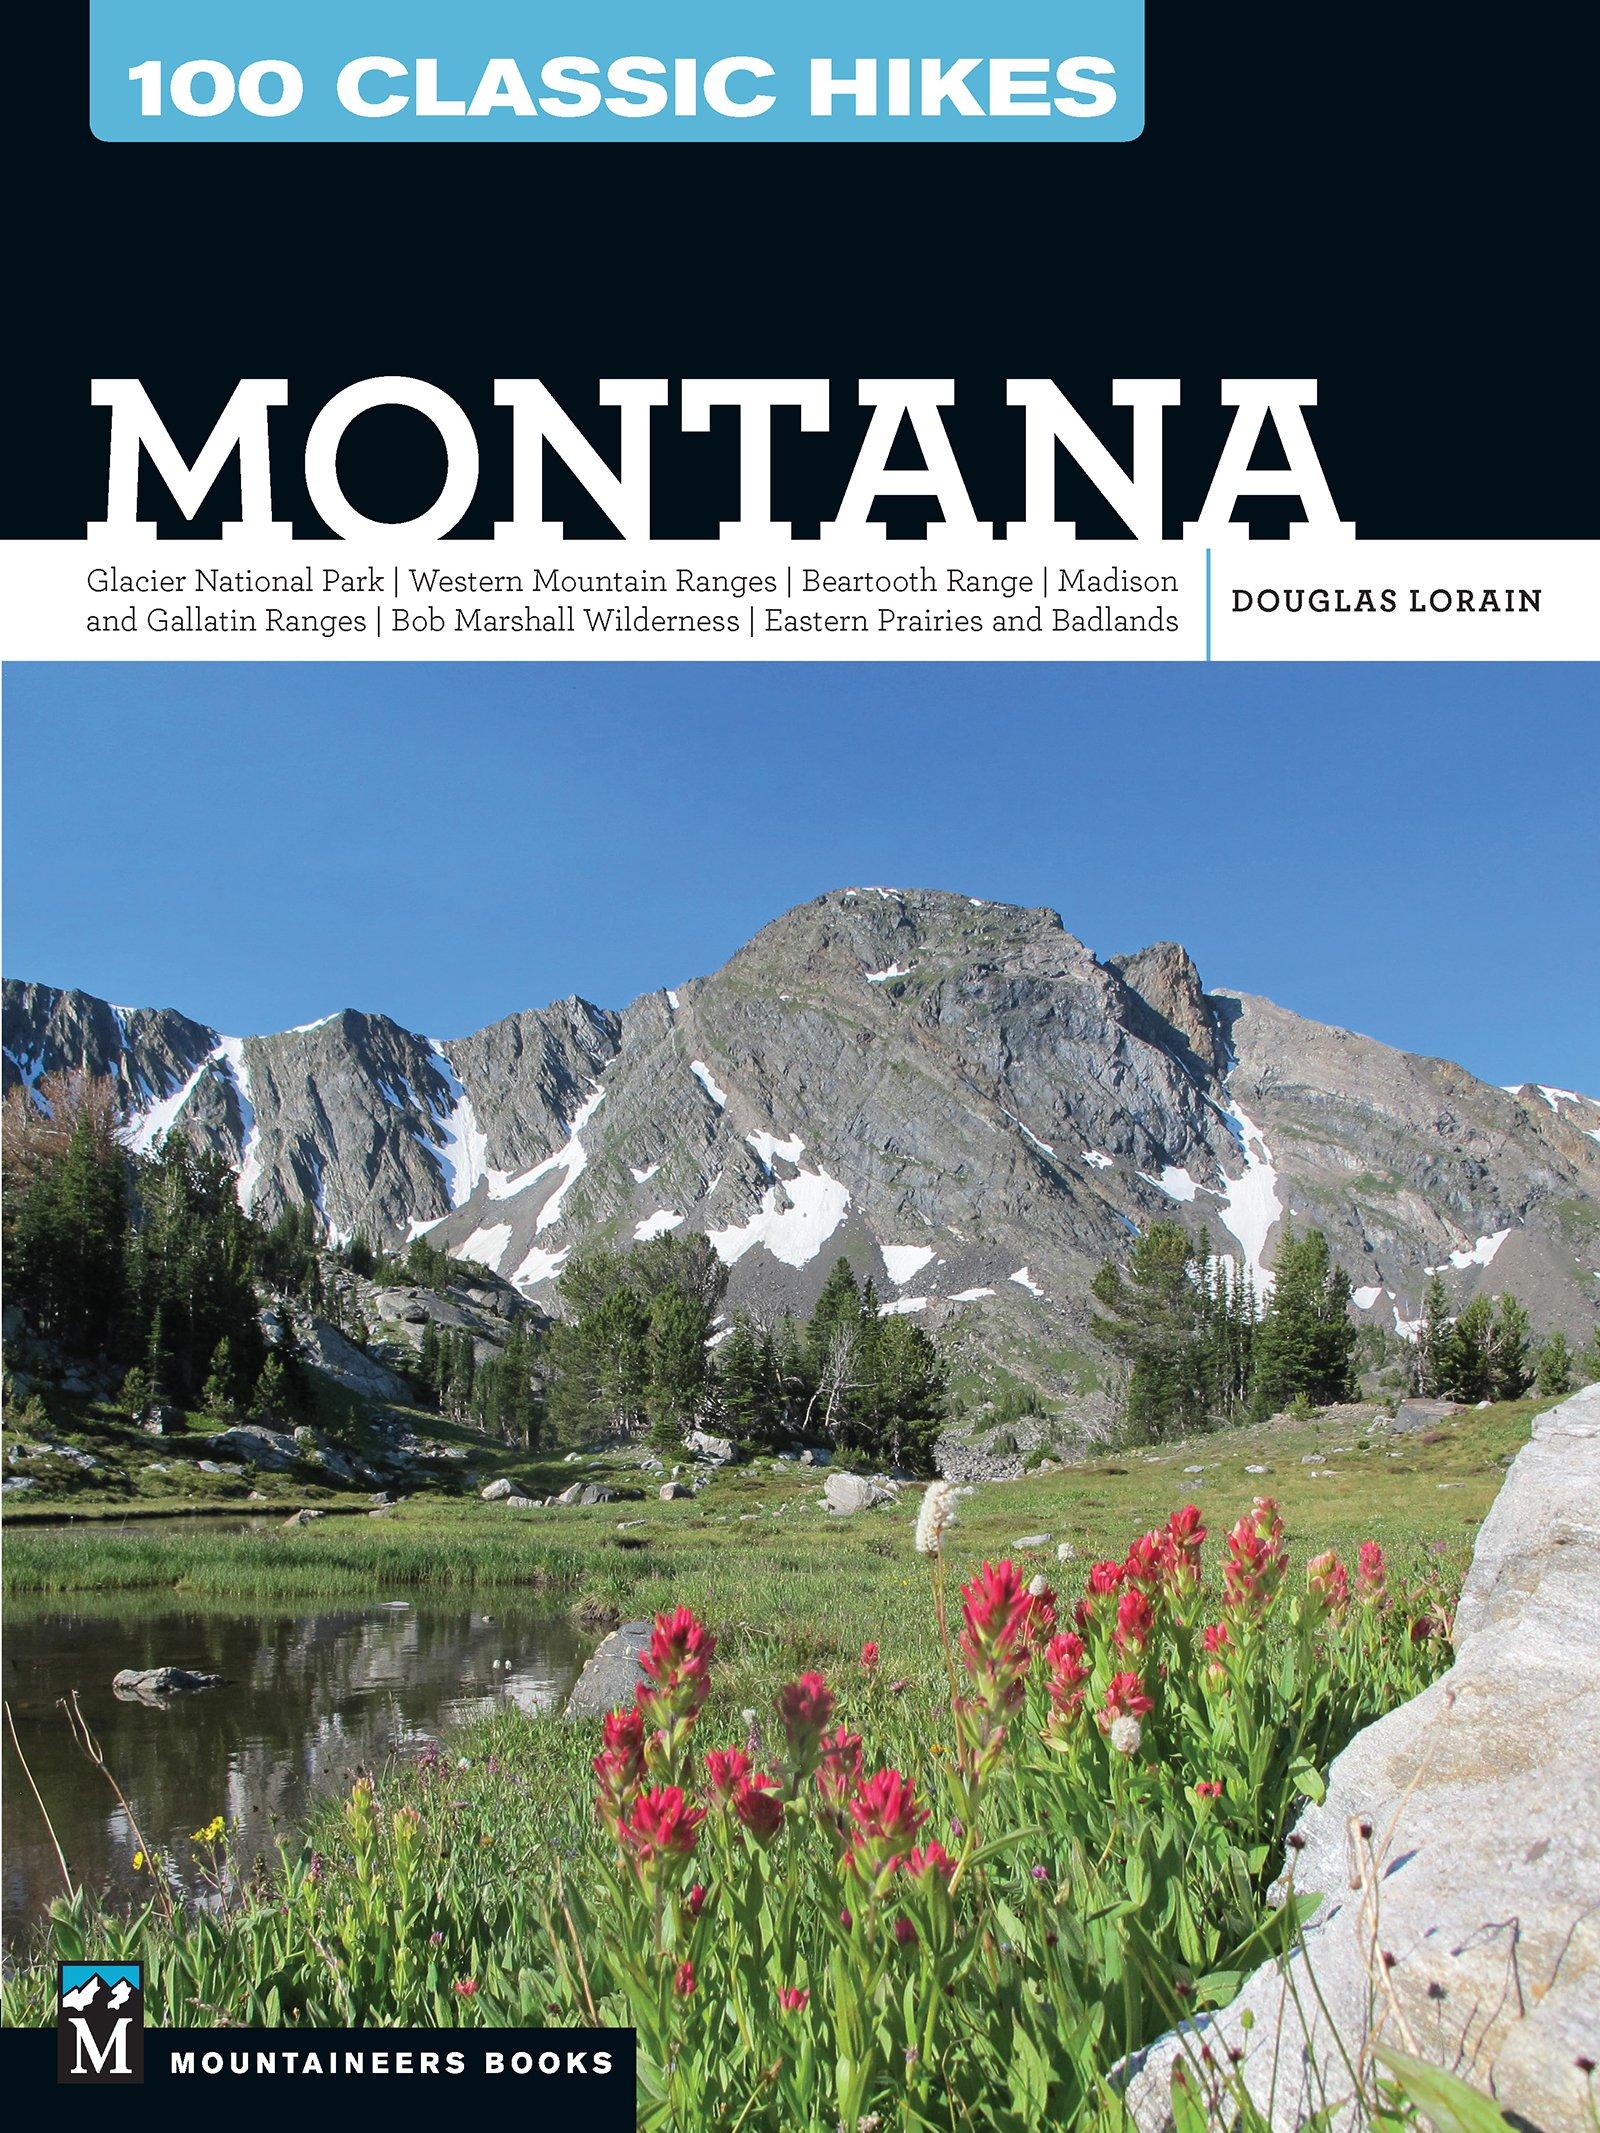 100 Classic Hikes Beartooth Wilderness